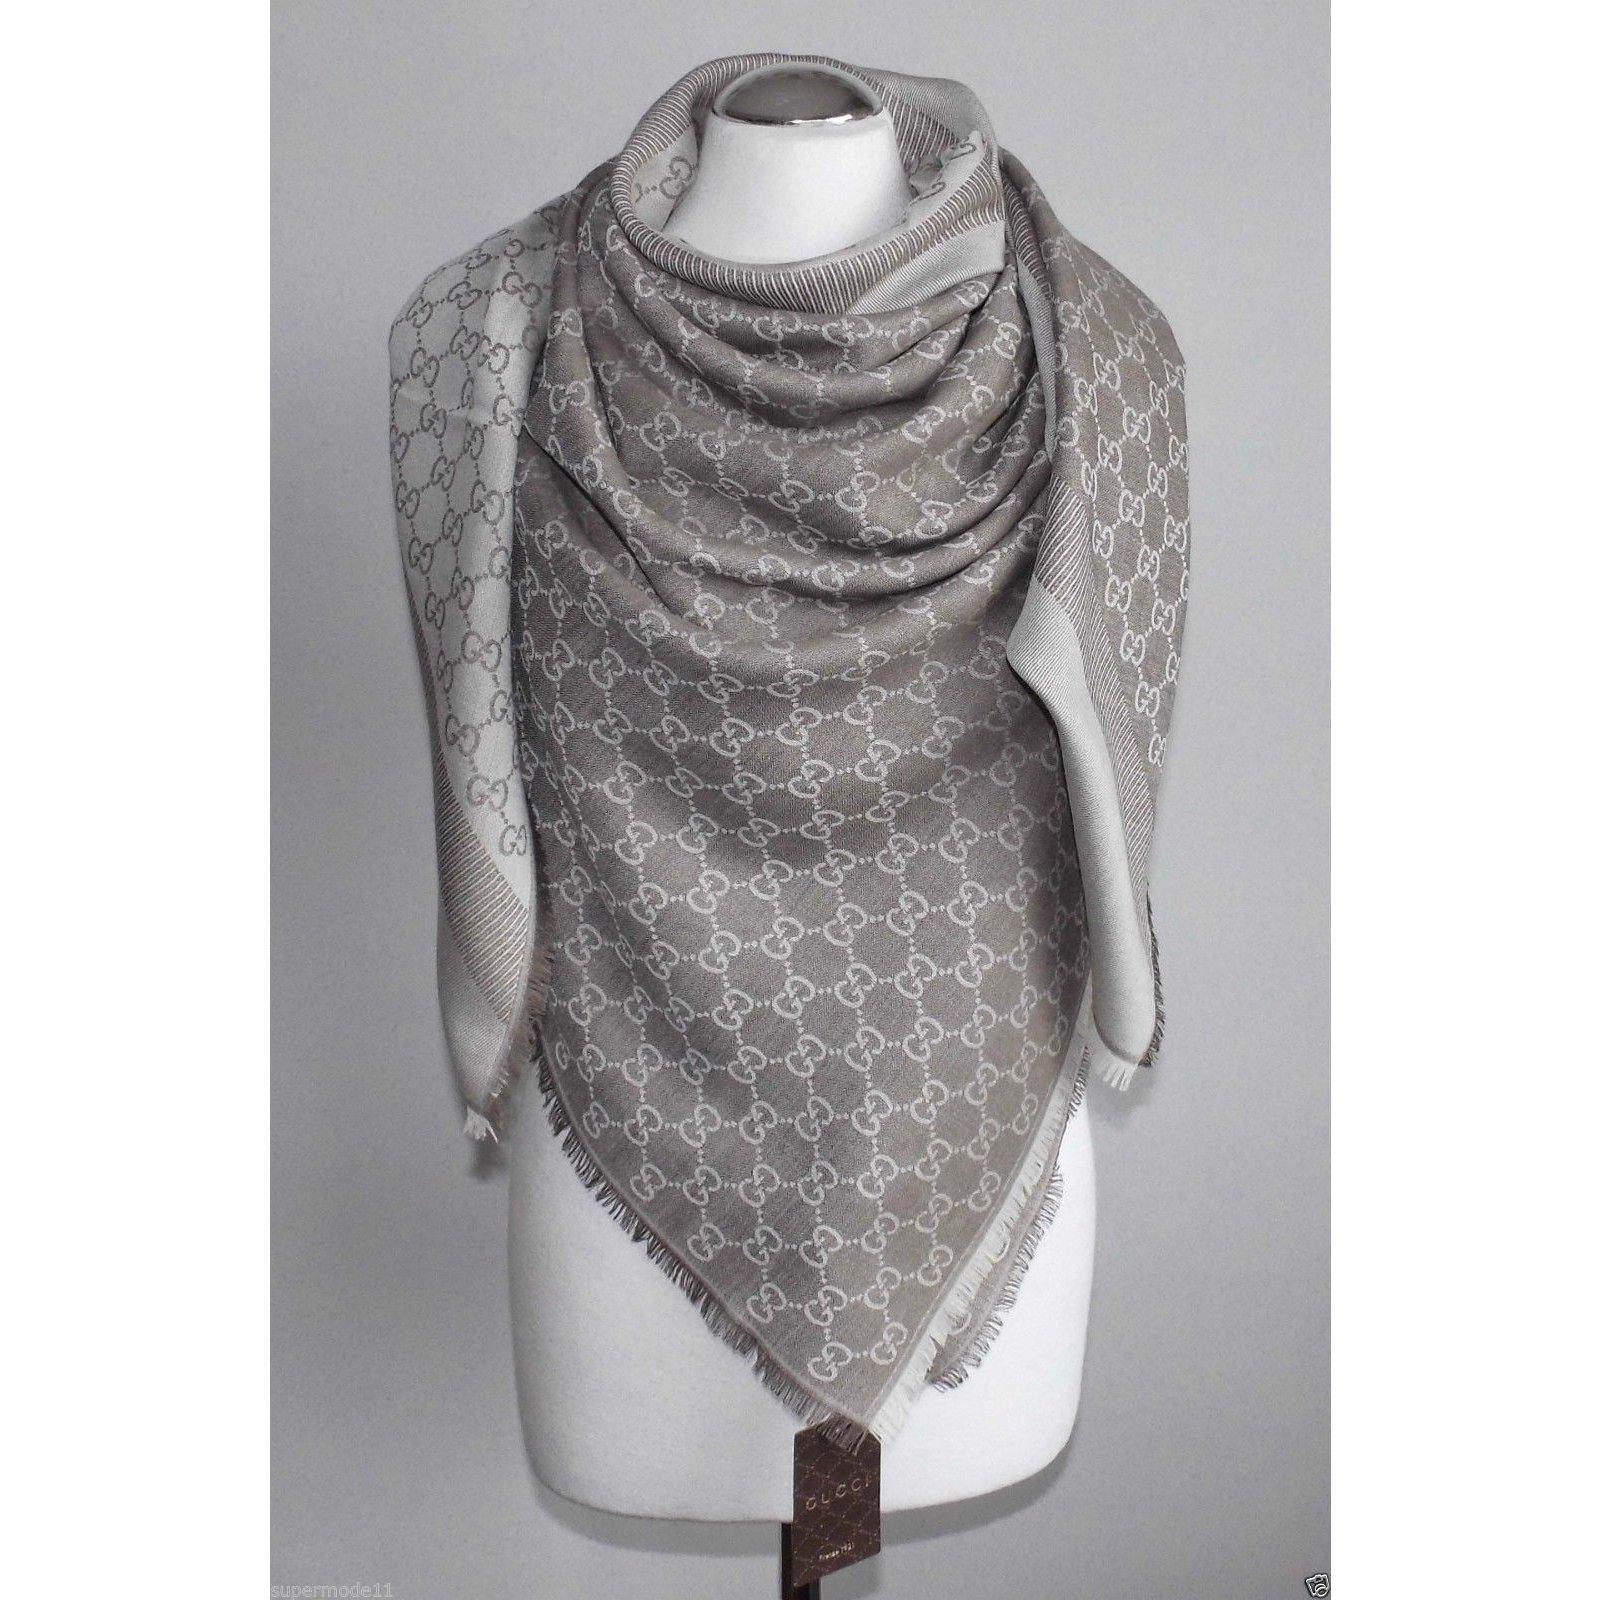 4ba27abef59d Gucci web new scarves silk wool multiple colors ref joli closet jpg  1600x1600 Gucci scarves